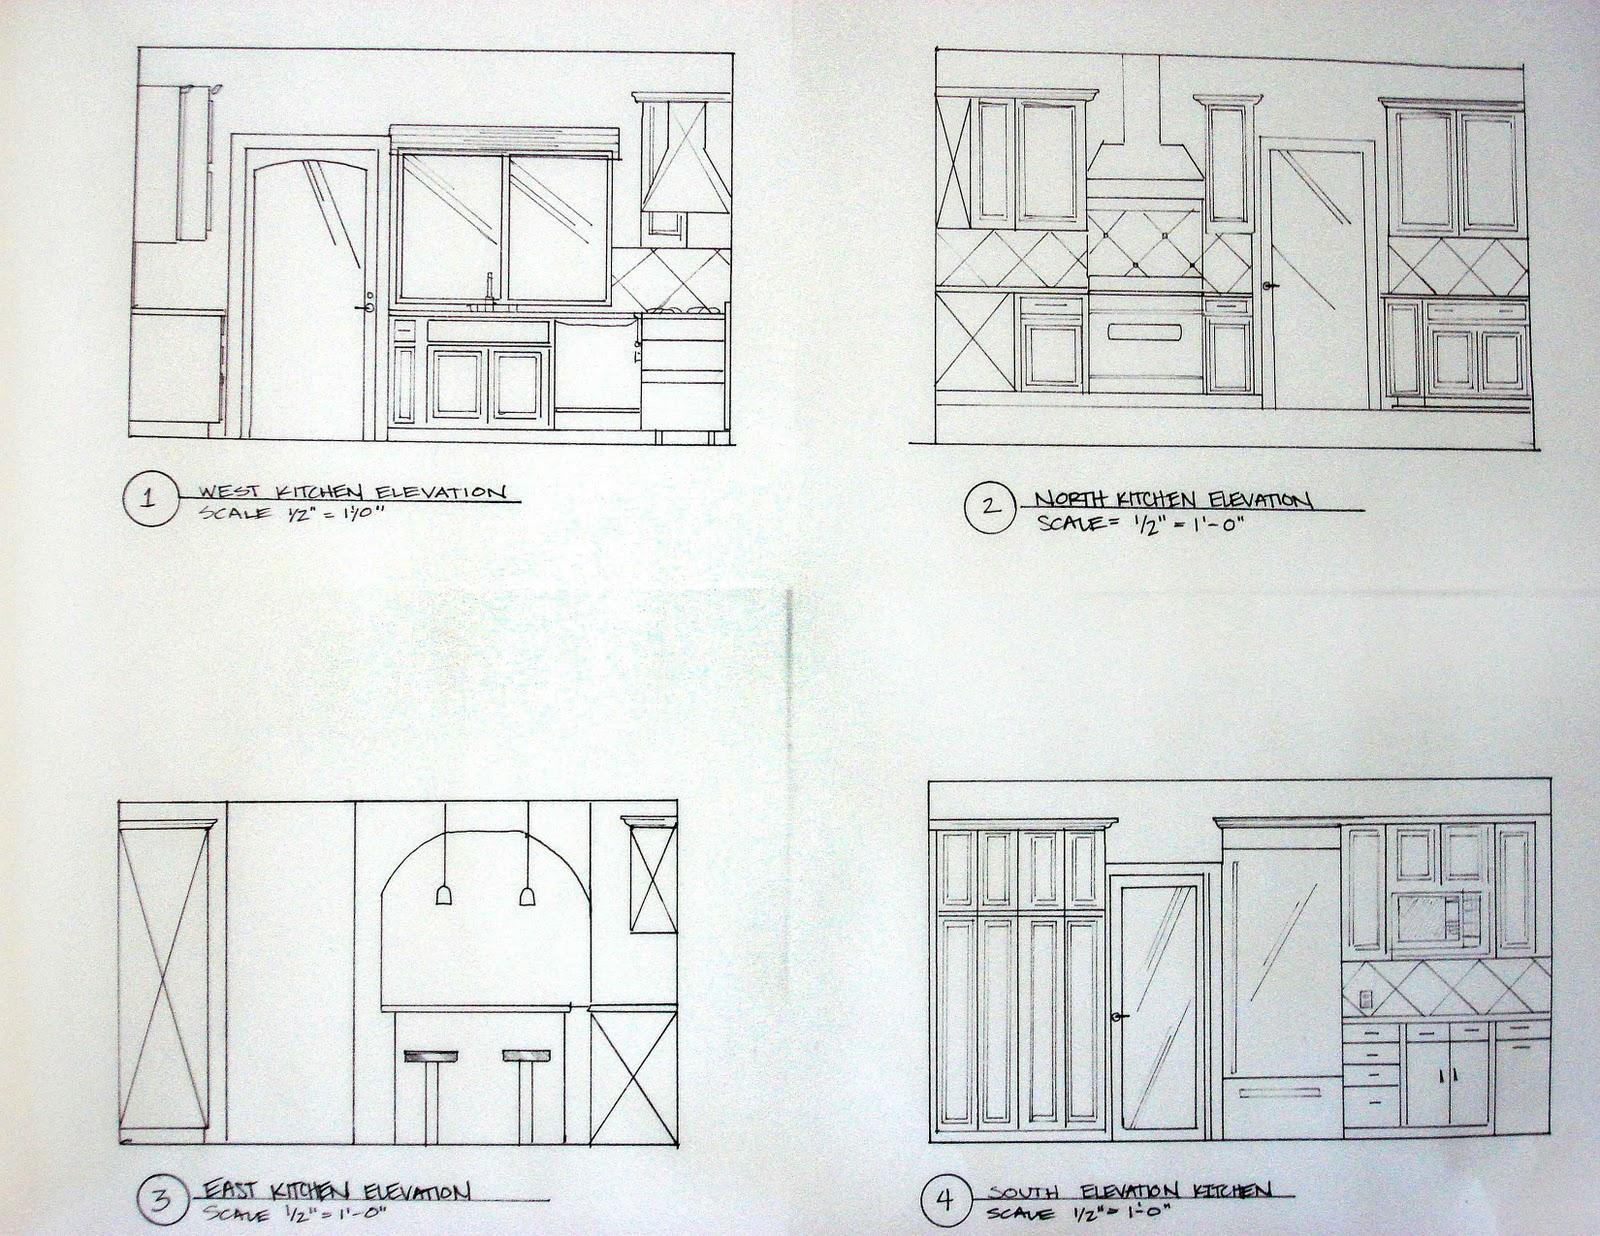 Kitchen Design Elevations suzy kloner design kitchen before and after design designedkc